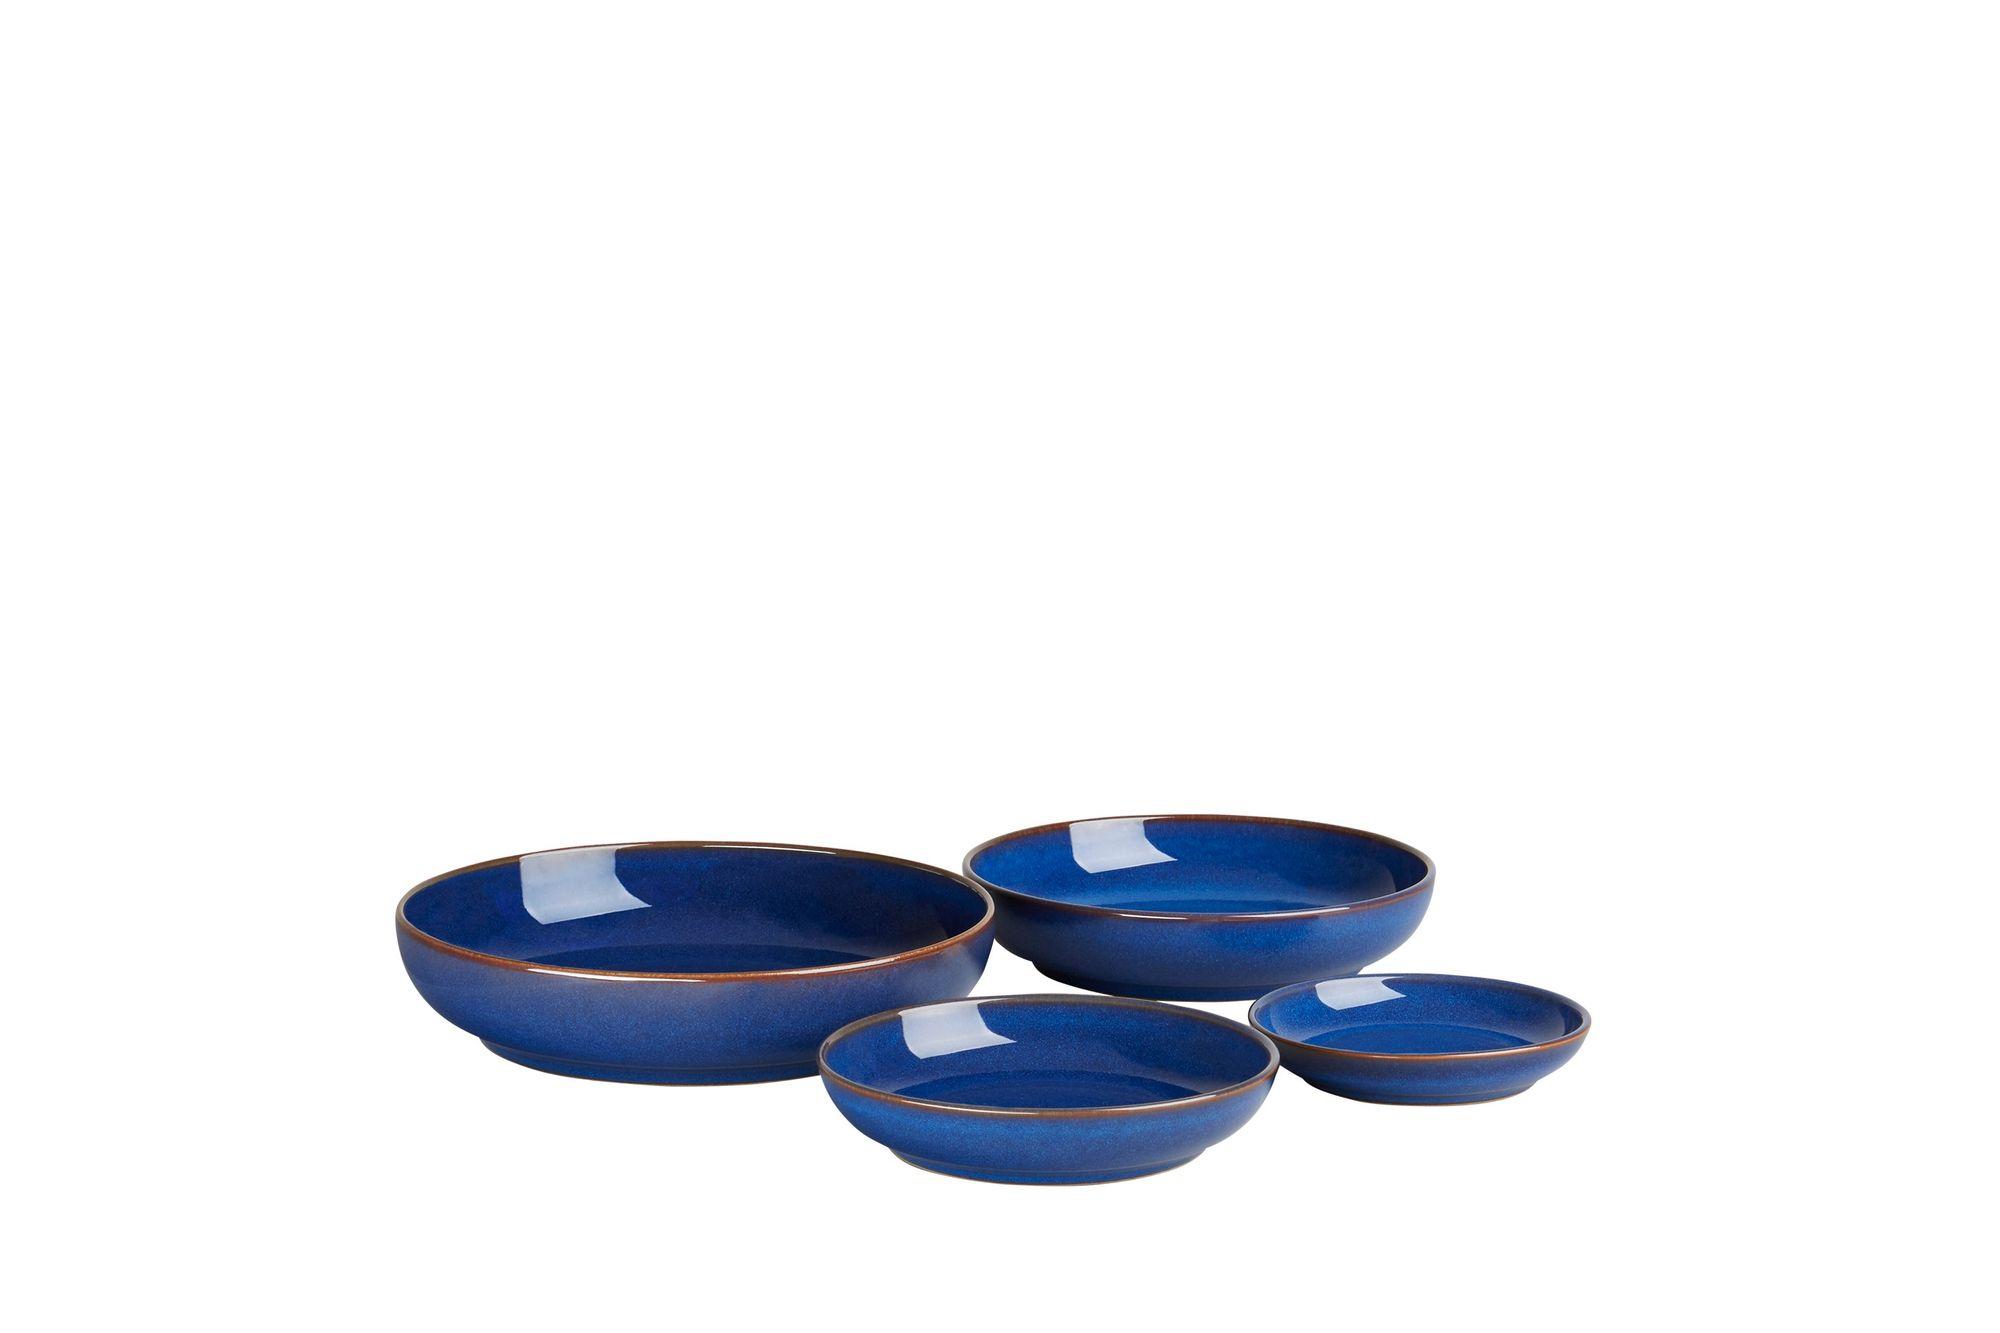 Denby Imperial Blue 4 Piece Nesting Bowl Set thumb 2